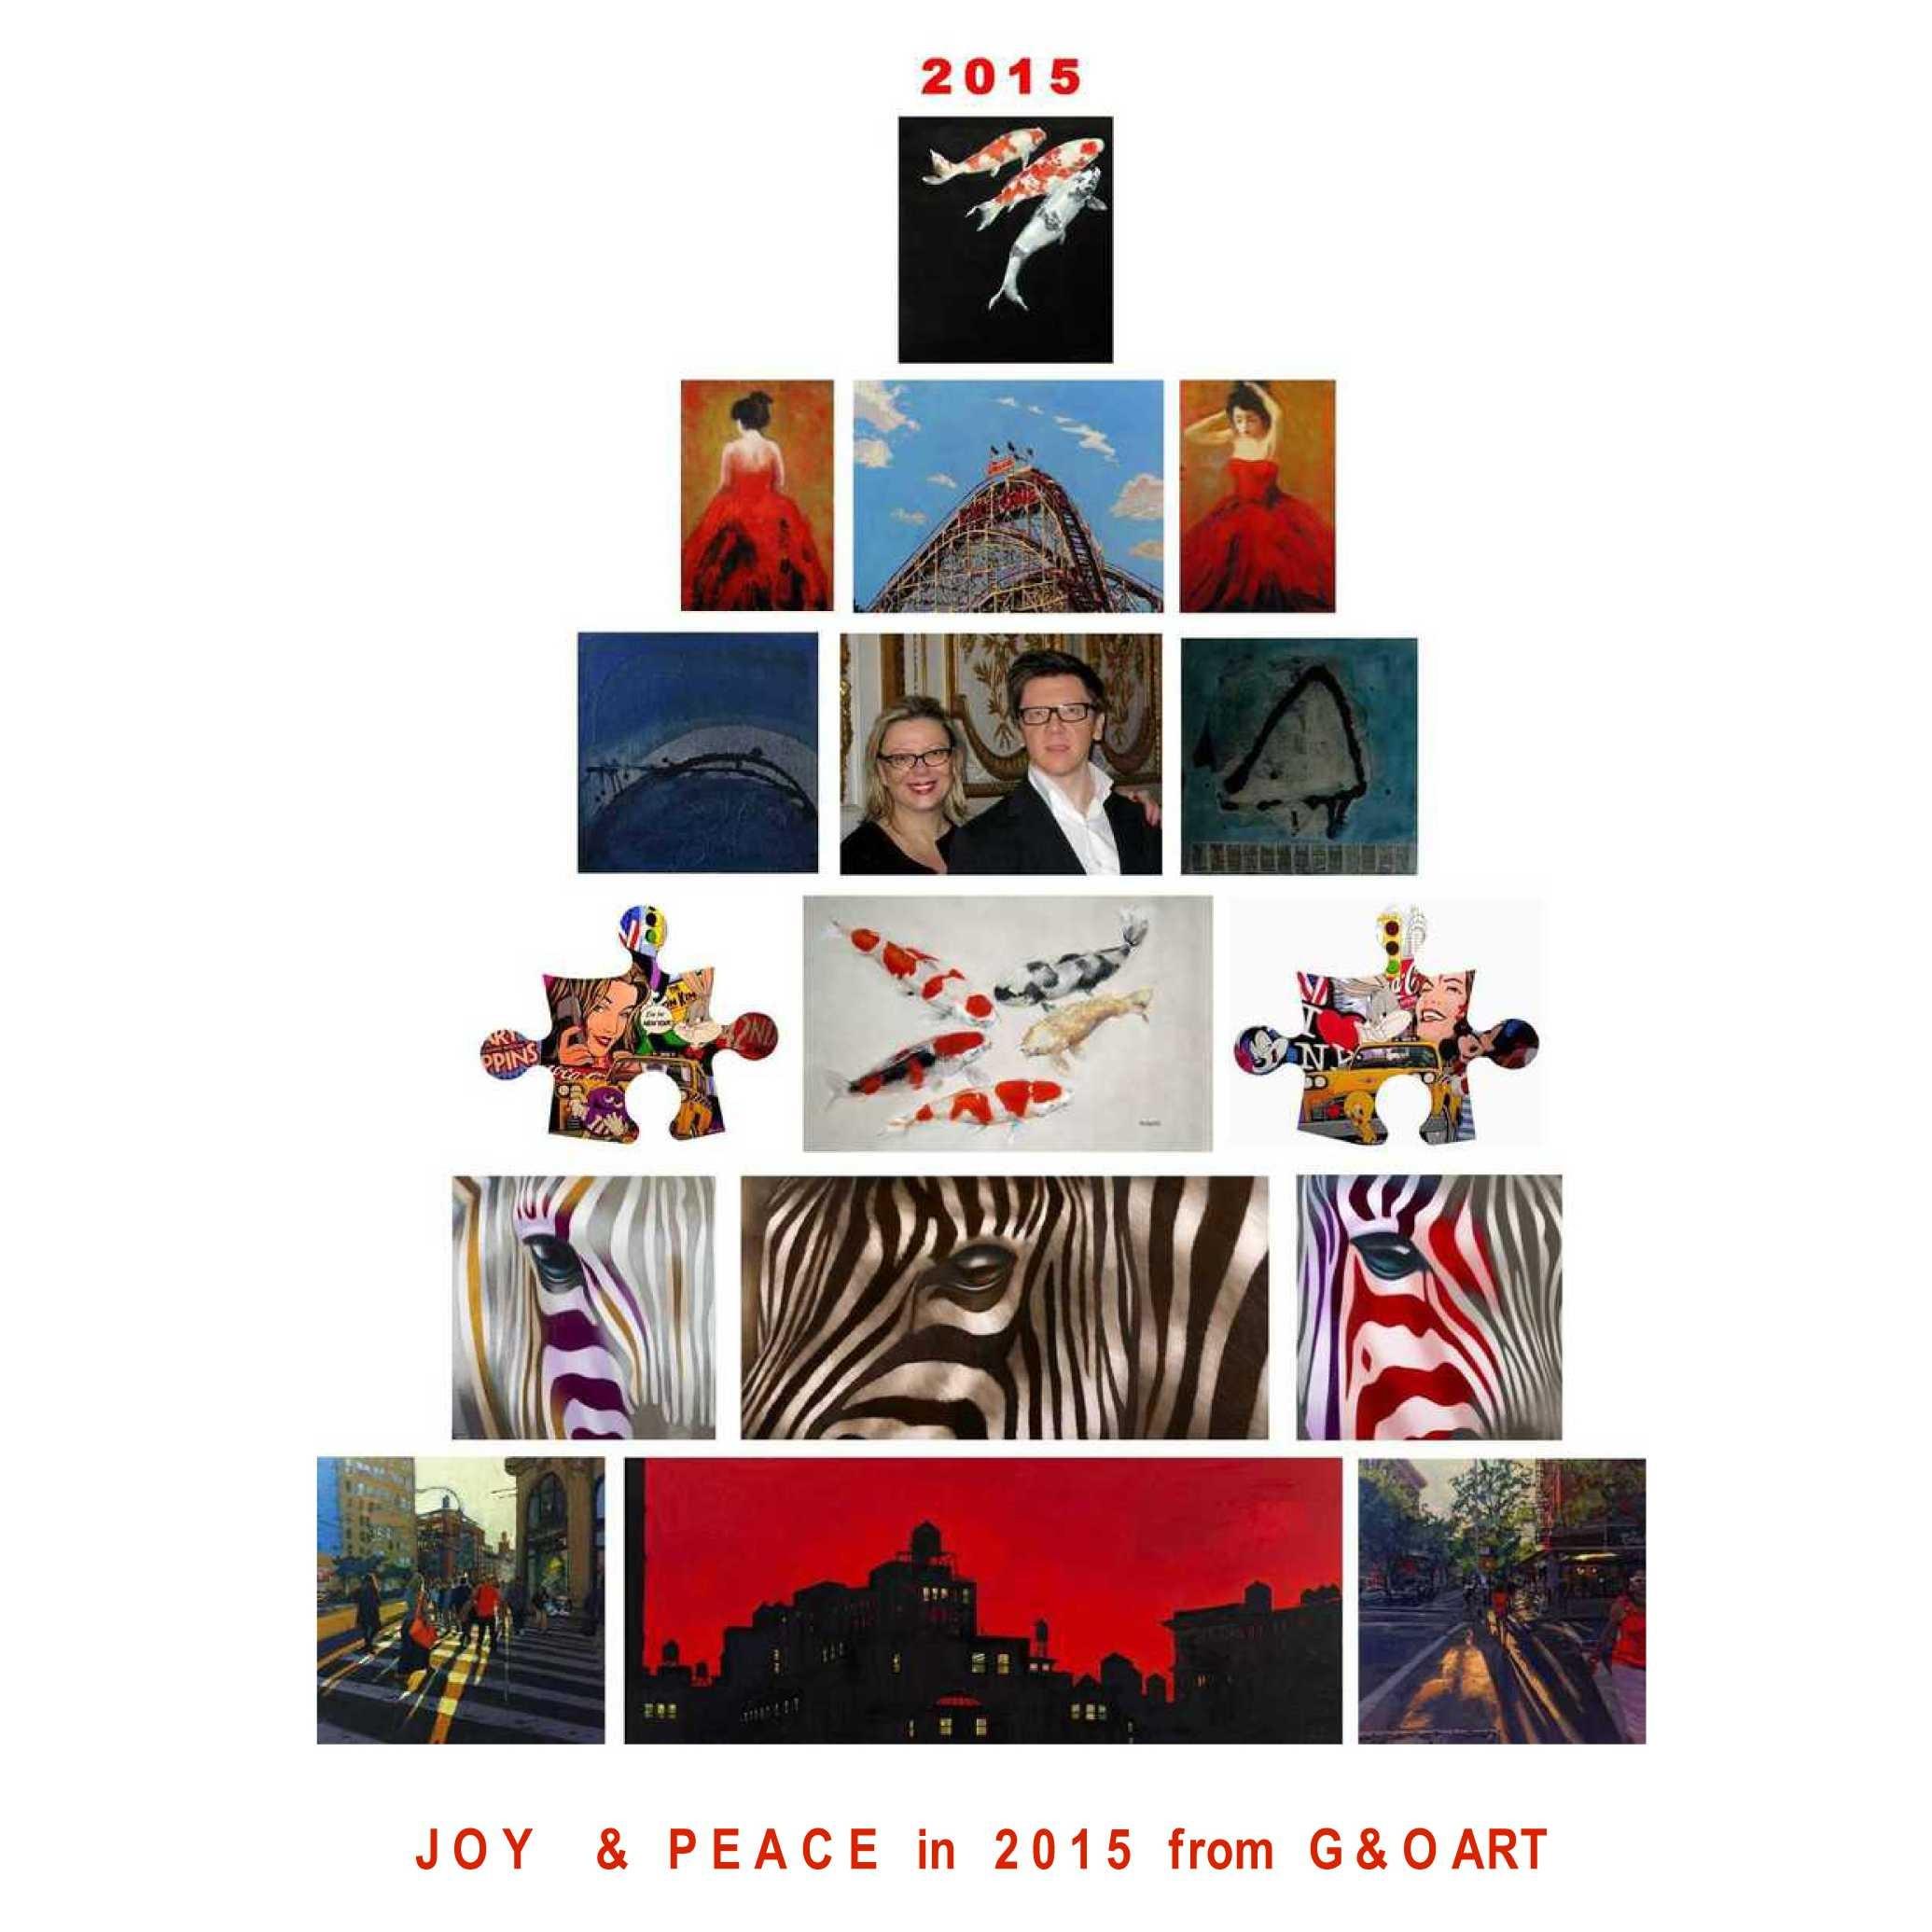 Joy and Peace 2015